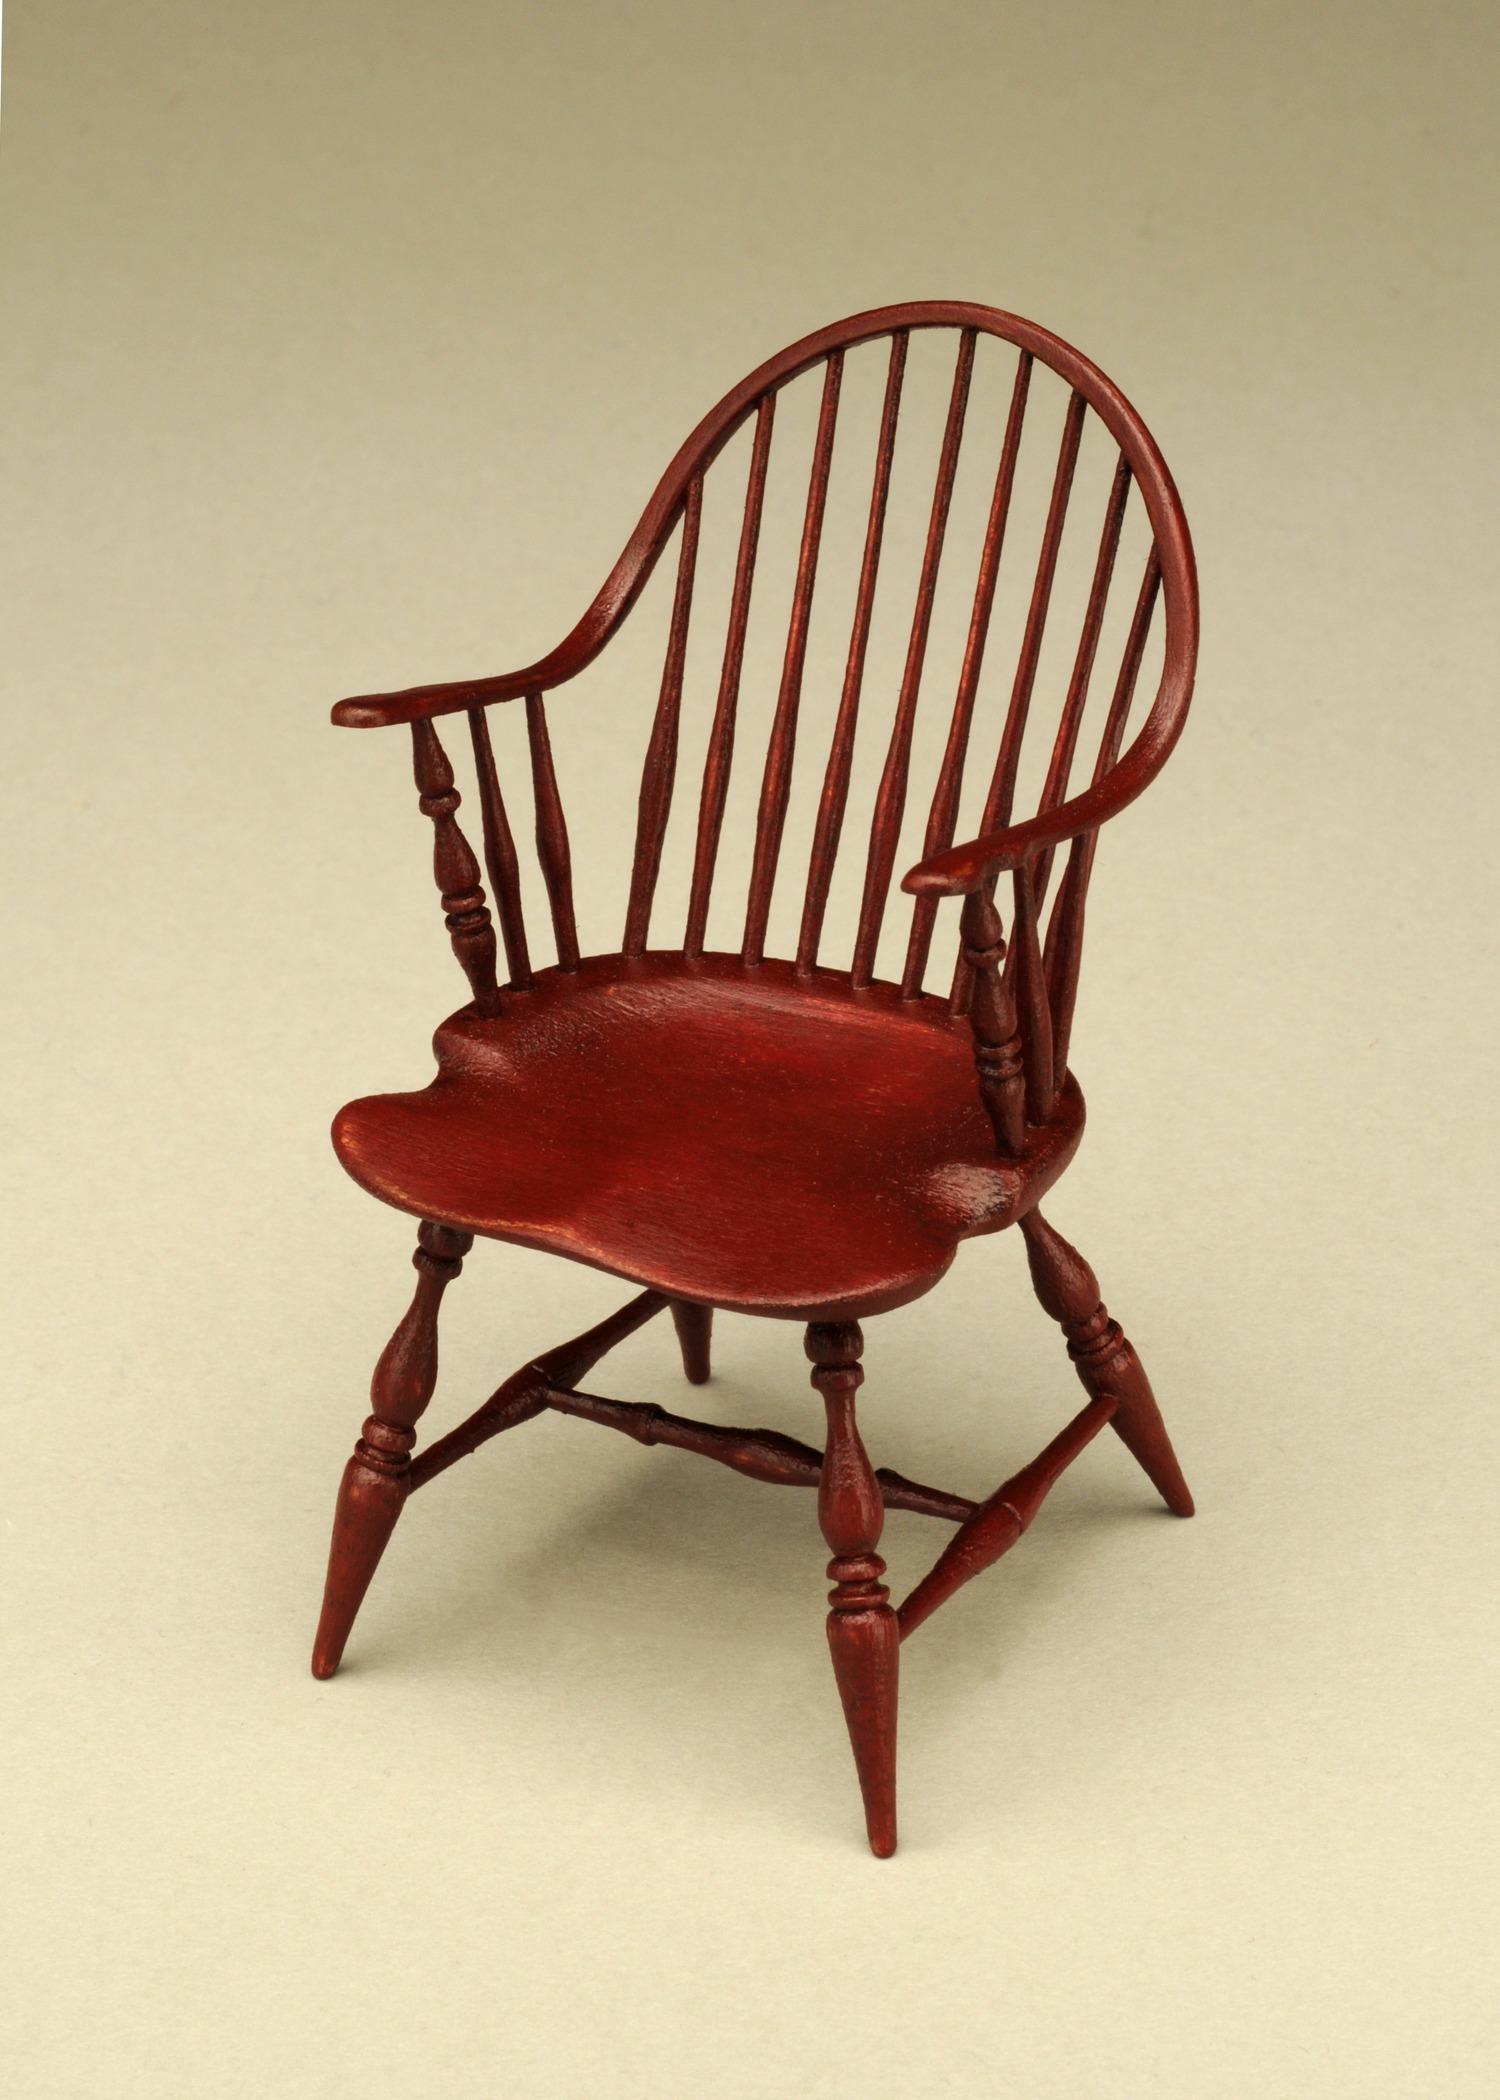 Murphy411Continuous arm chair - Copy-p1afi13mrvnbs1d0s1kof1afr1q85.jpg